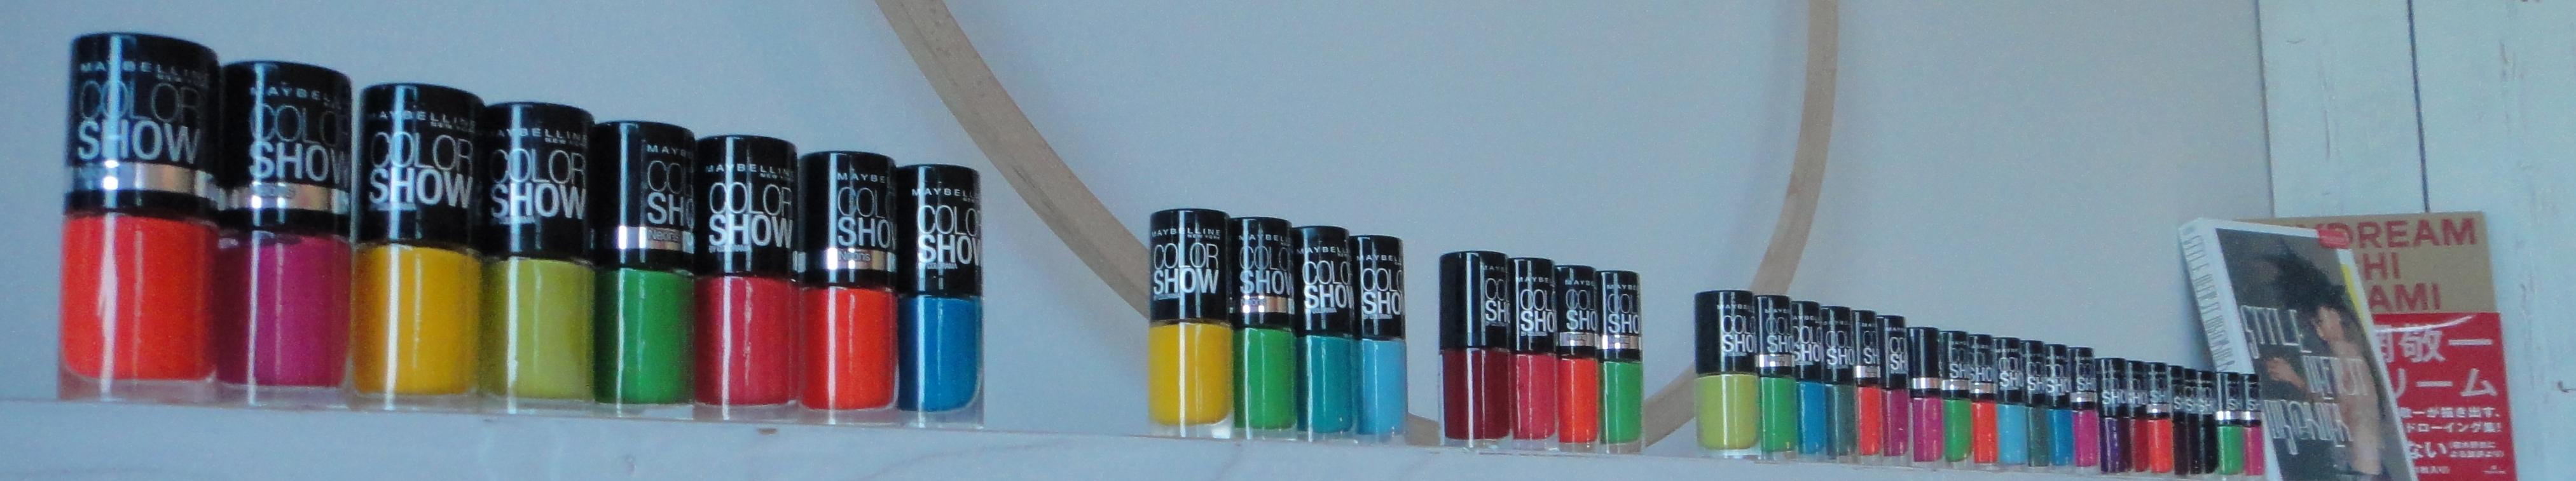 Maybelline Jade Colorshow Nagellacke / nail polishes